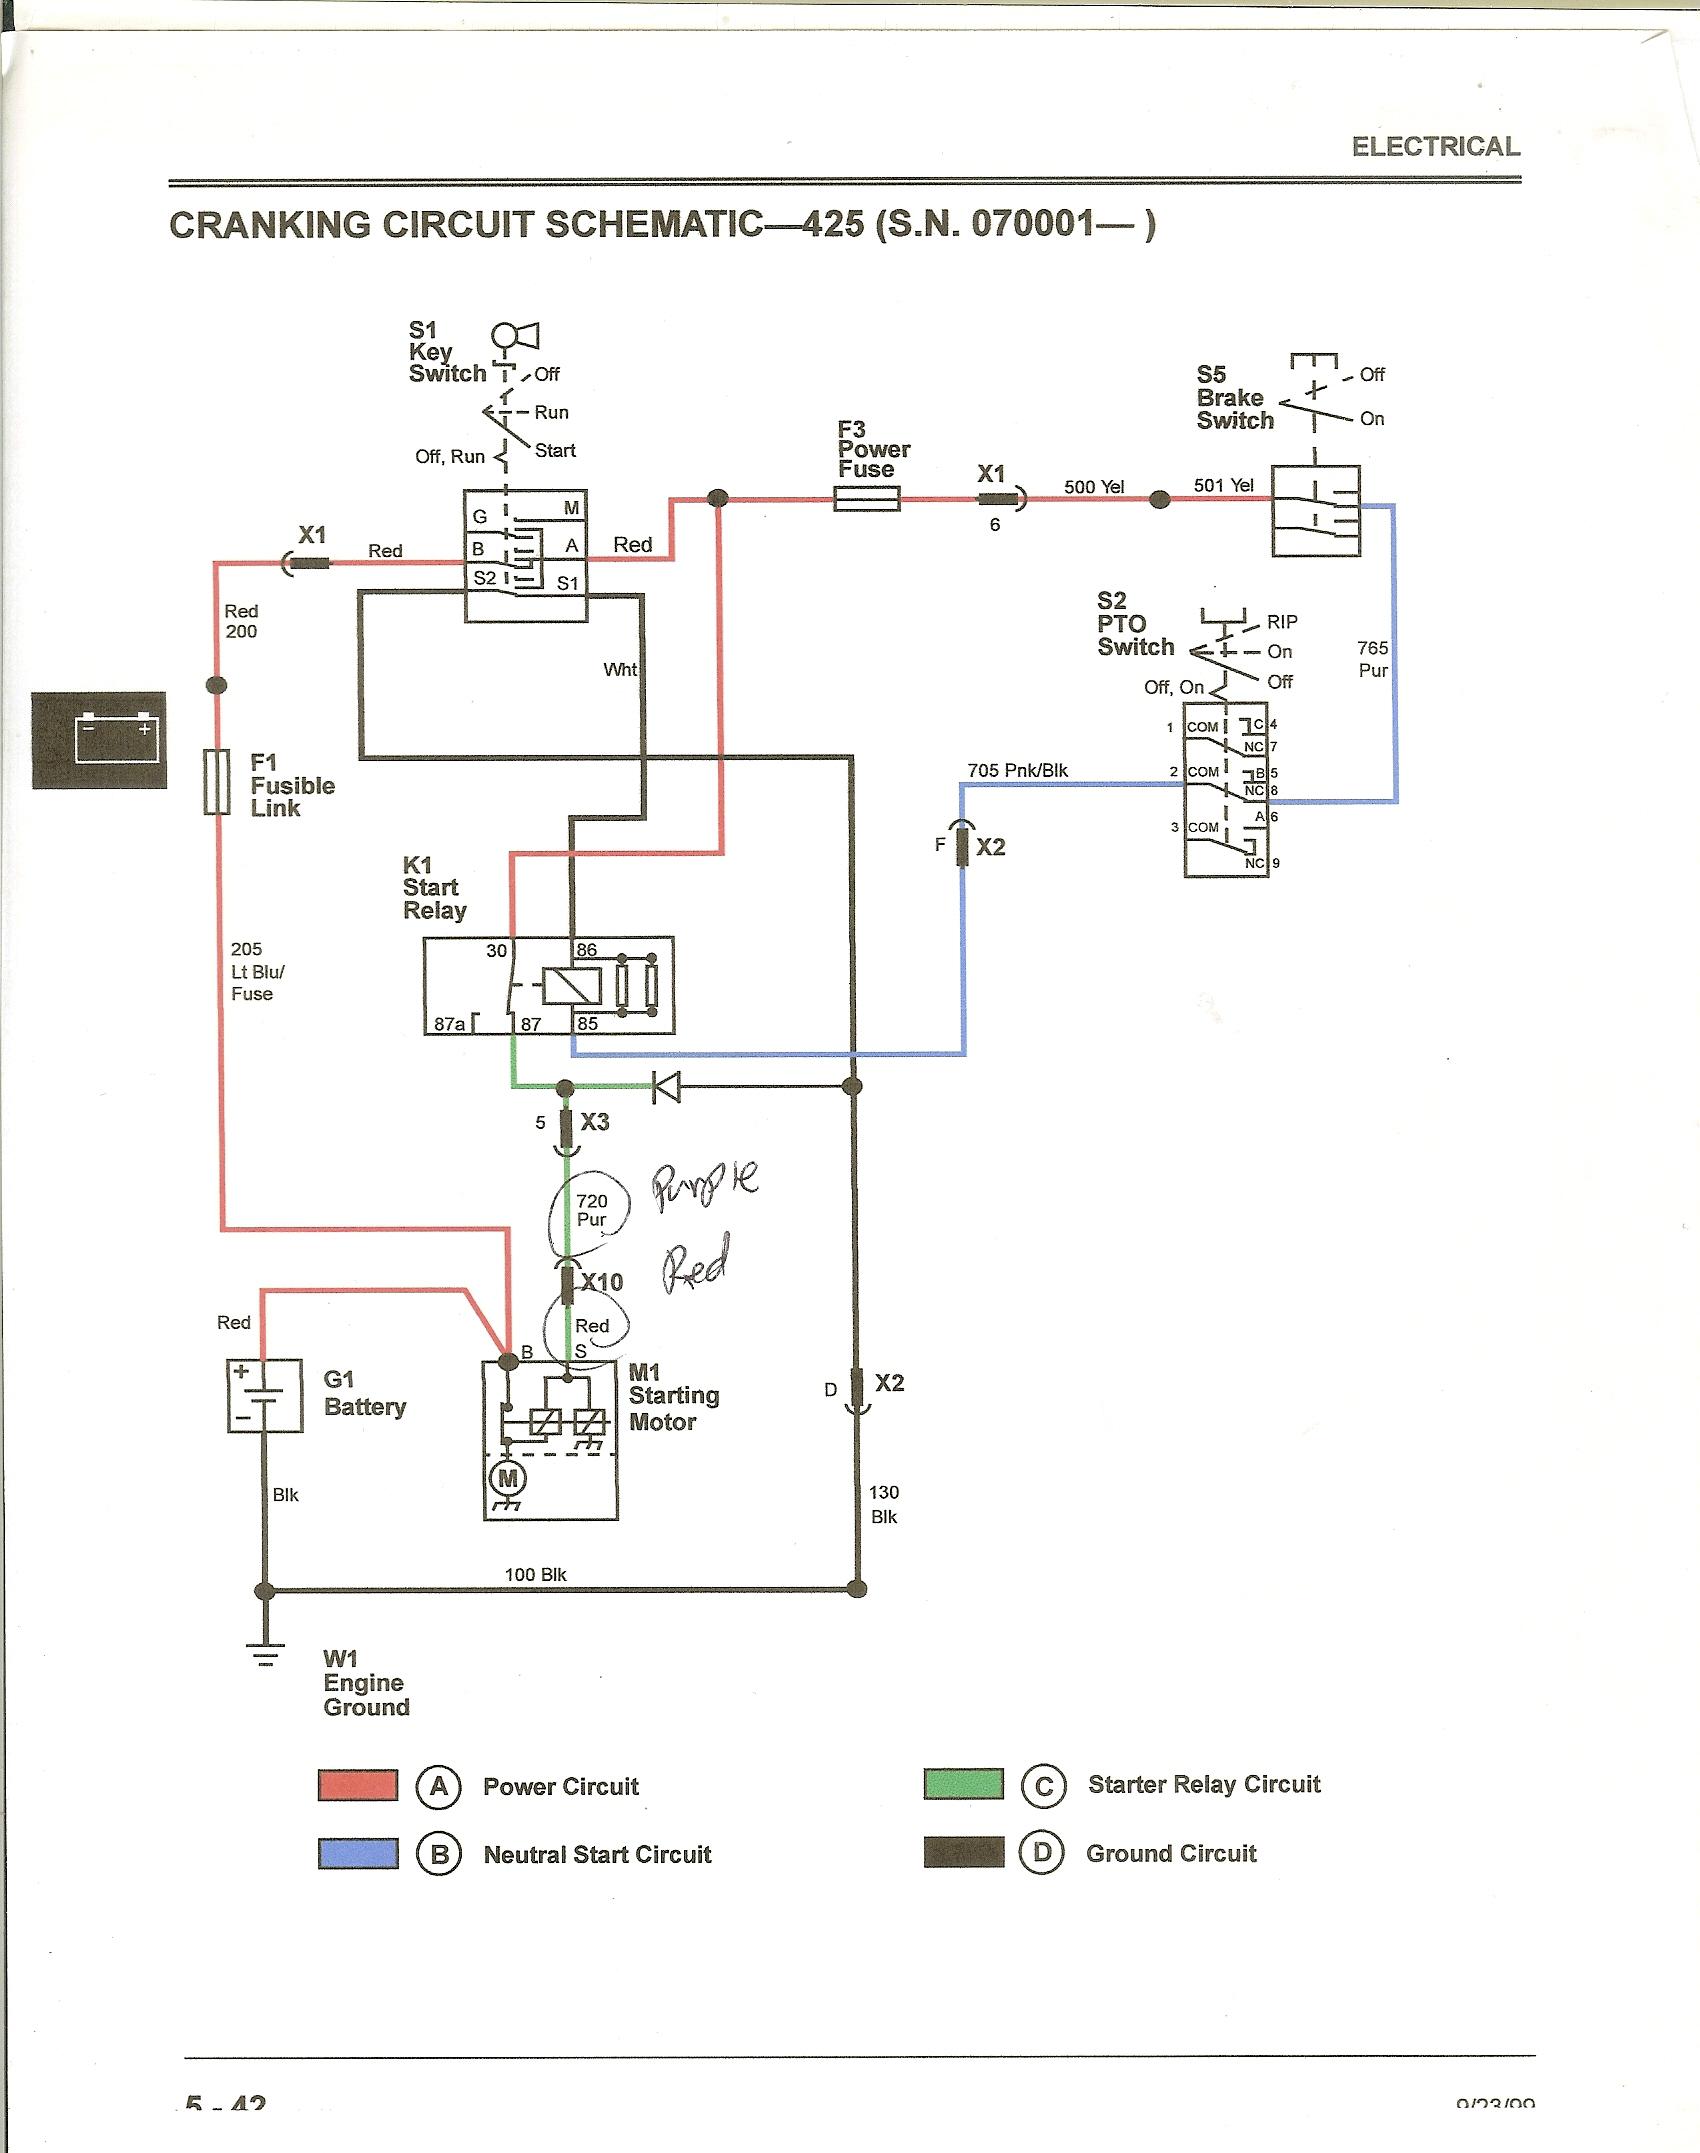 425 ignition - Motor cranks when key is turned to run ... on john deere l120 wiring diagram, john deere engine wiring diagram, john deere 170 pto wiring, muncie hydraulic electric shift wiring, john deere l111 wiring diagram, john deere mower wiring diagram, john deere 210 pto wiring, john deere 318 pto wiring, john deere radio wiring diagram, john deere alternator wiring diagram, john deere tractor wiring, john deere 50 wiring diagram, john deere 345 pto wiring, john deere 160 pto wiring, john deere 650 wiring diagram, john 10 10 switch wiring diagram, john deere 425 engine diagrams, john deere 316 pto wiring,